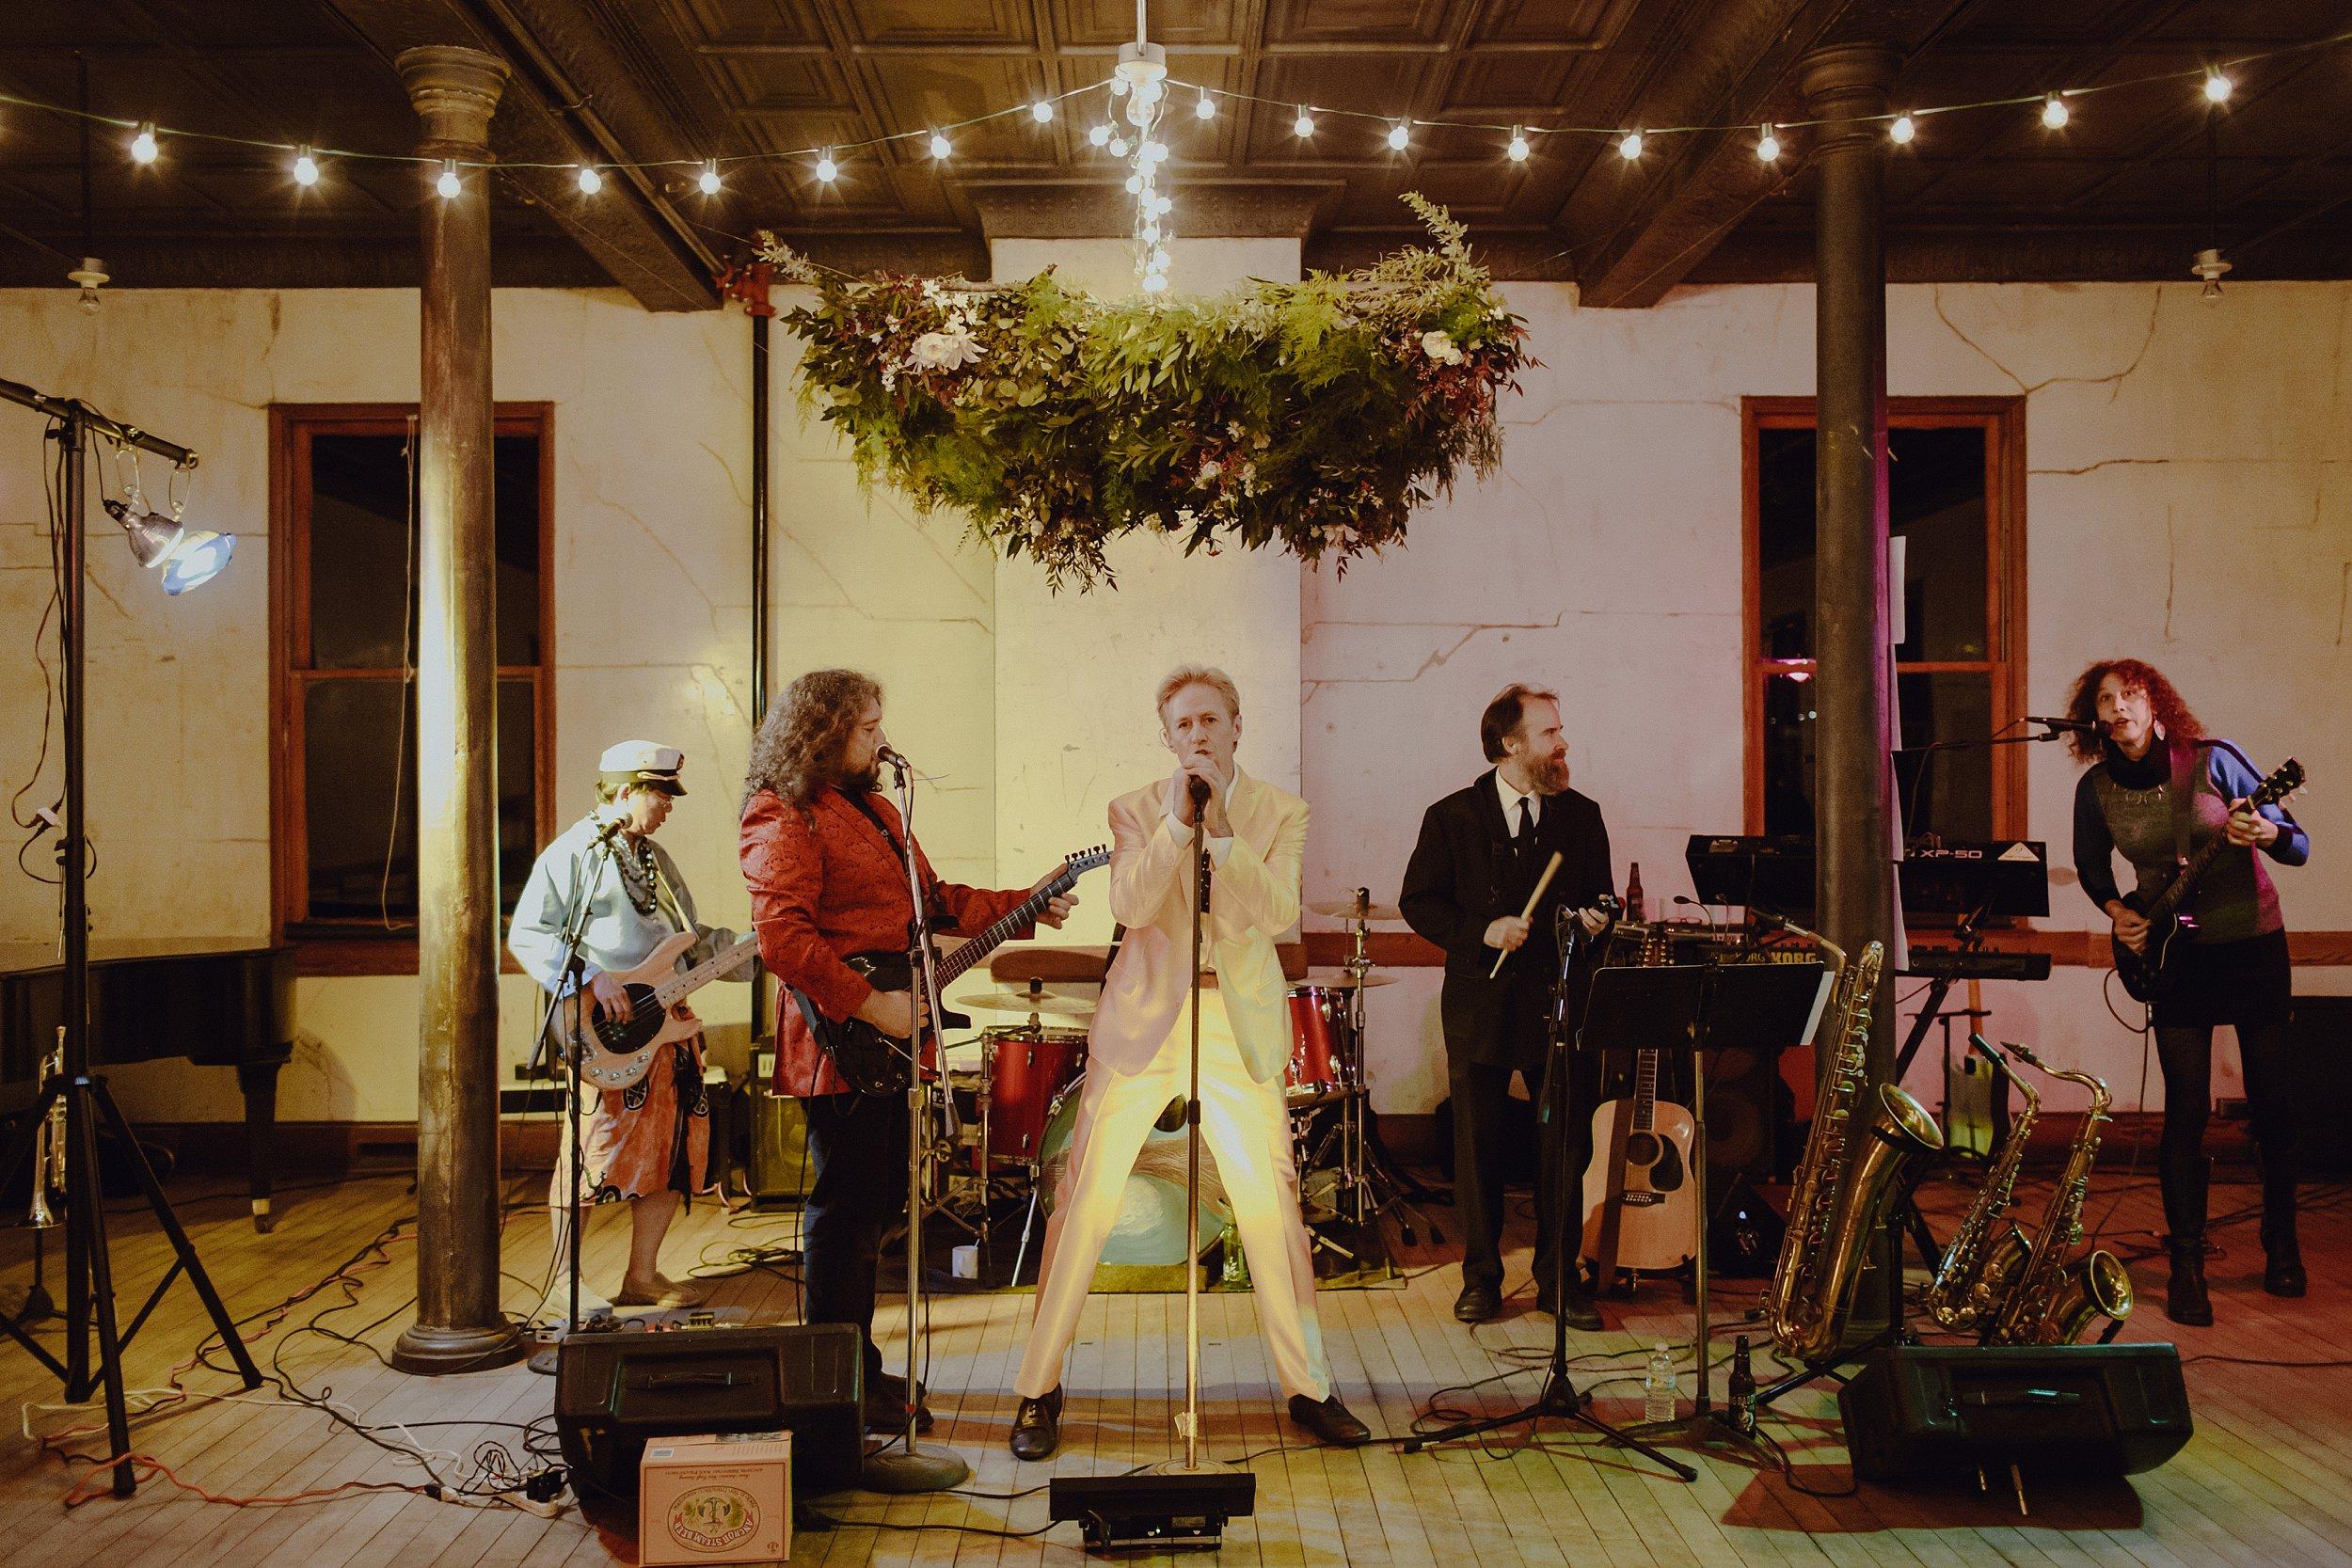 headlands-center-for-the-arts-wedding_0079.jpg